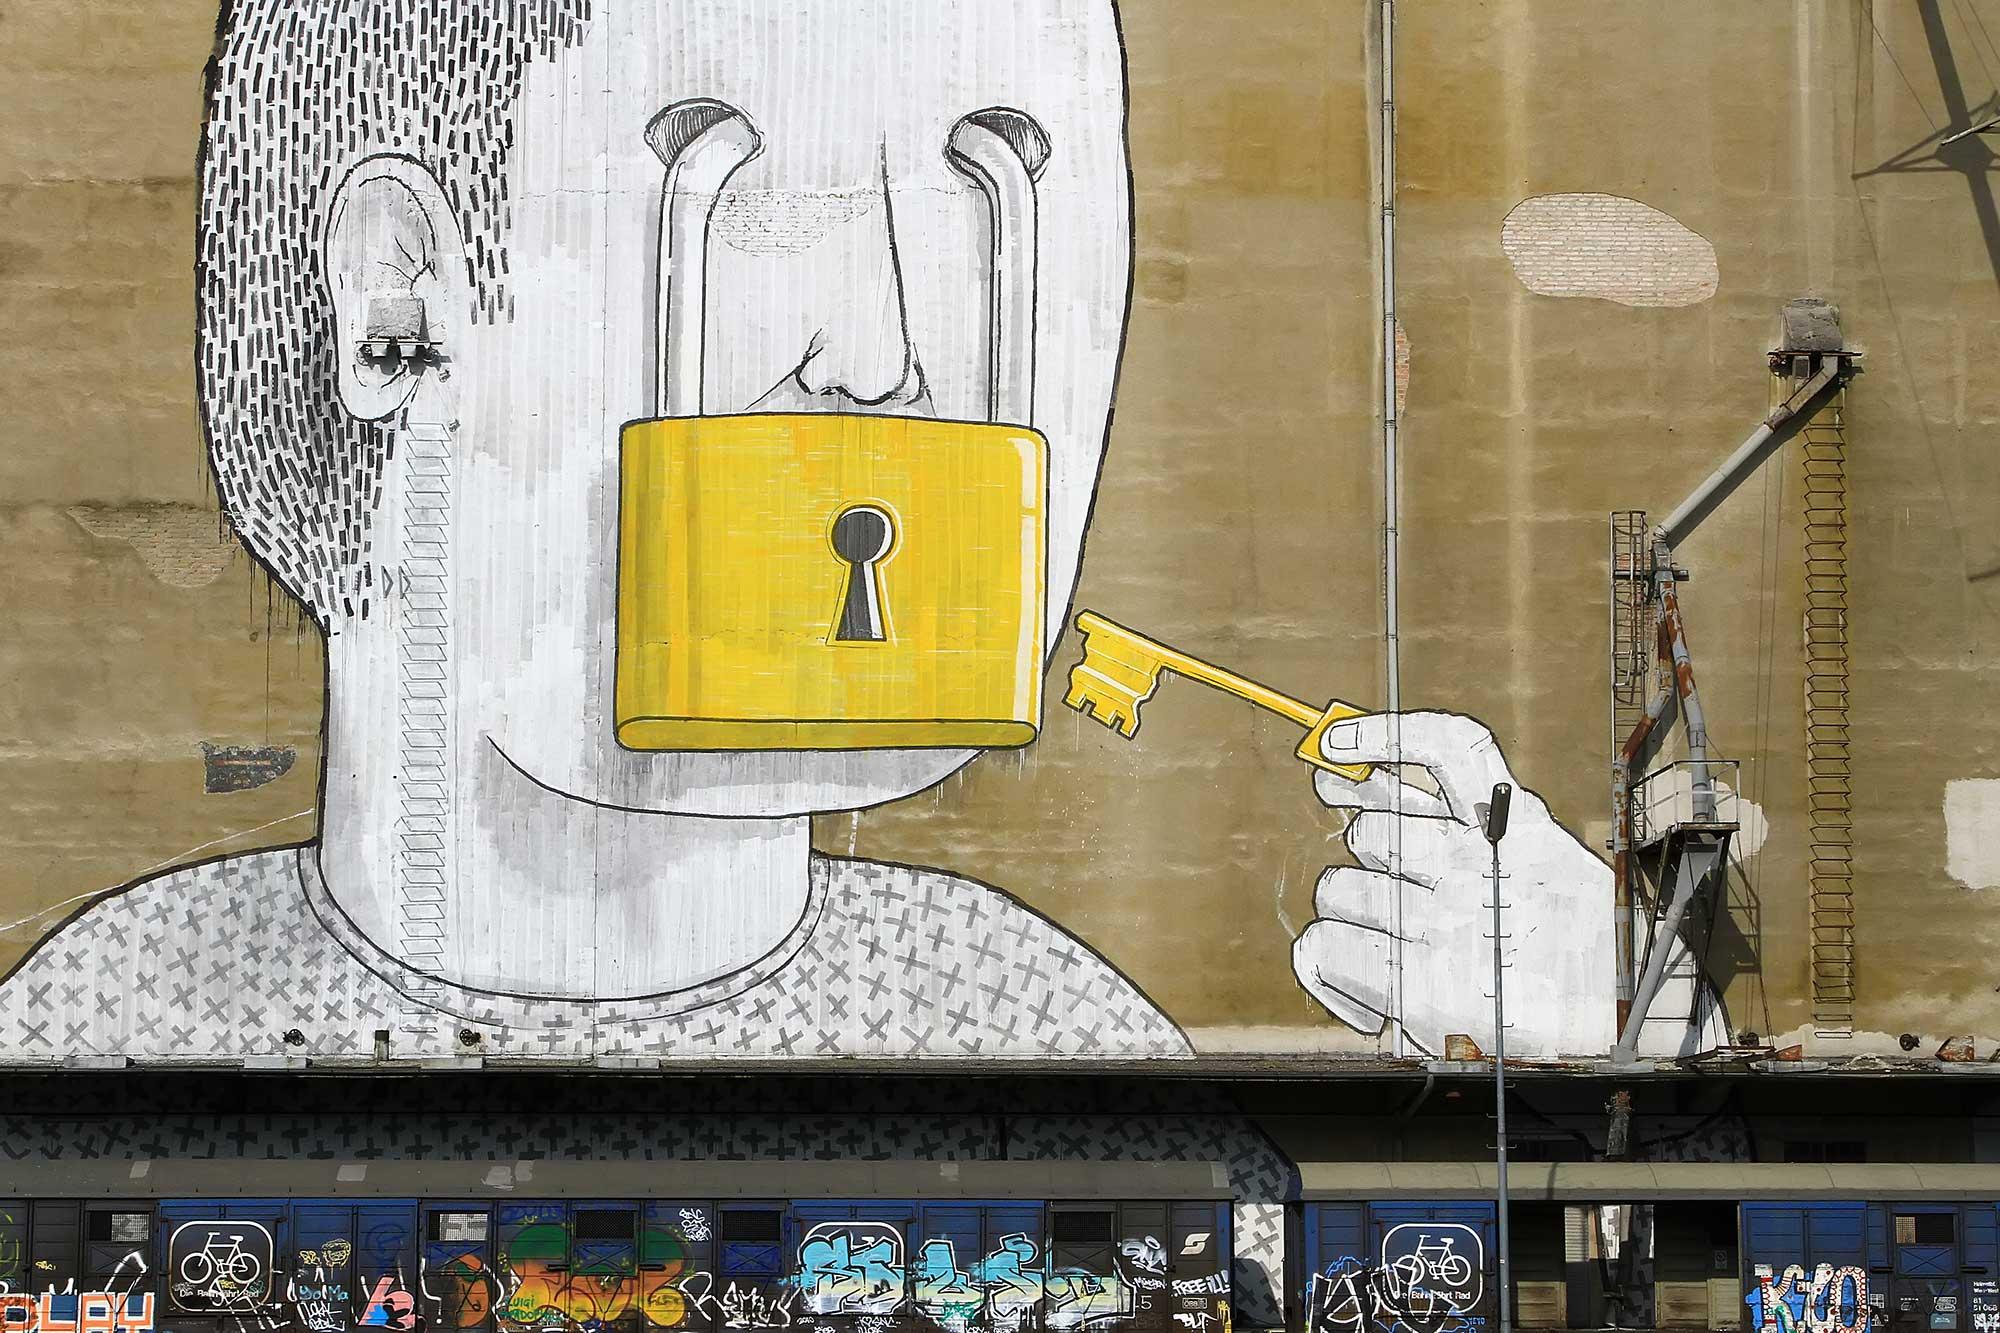 Graffiti in Vienna. © Ulli Maier & Nisa Maier